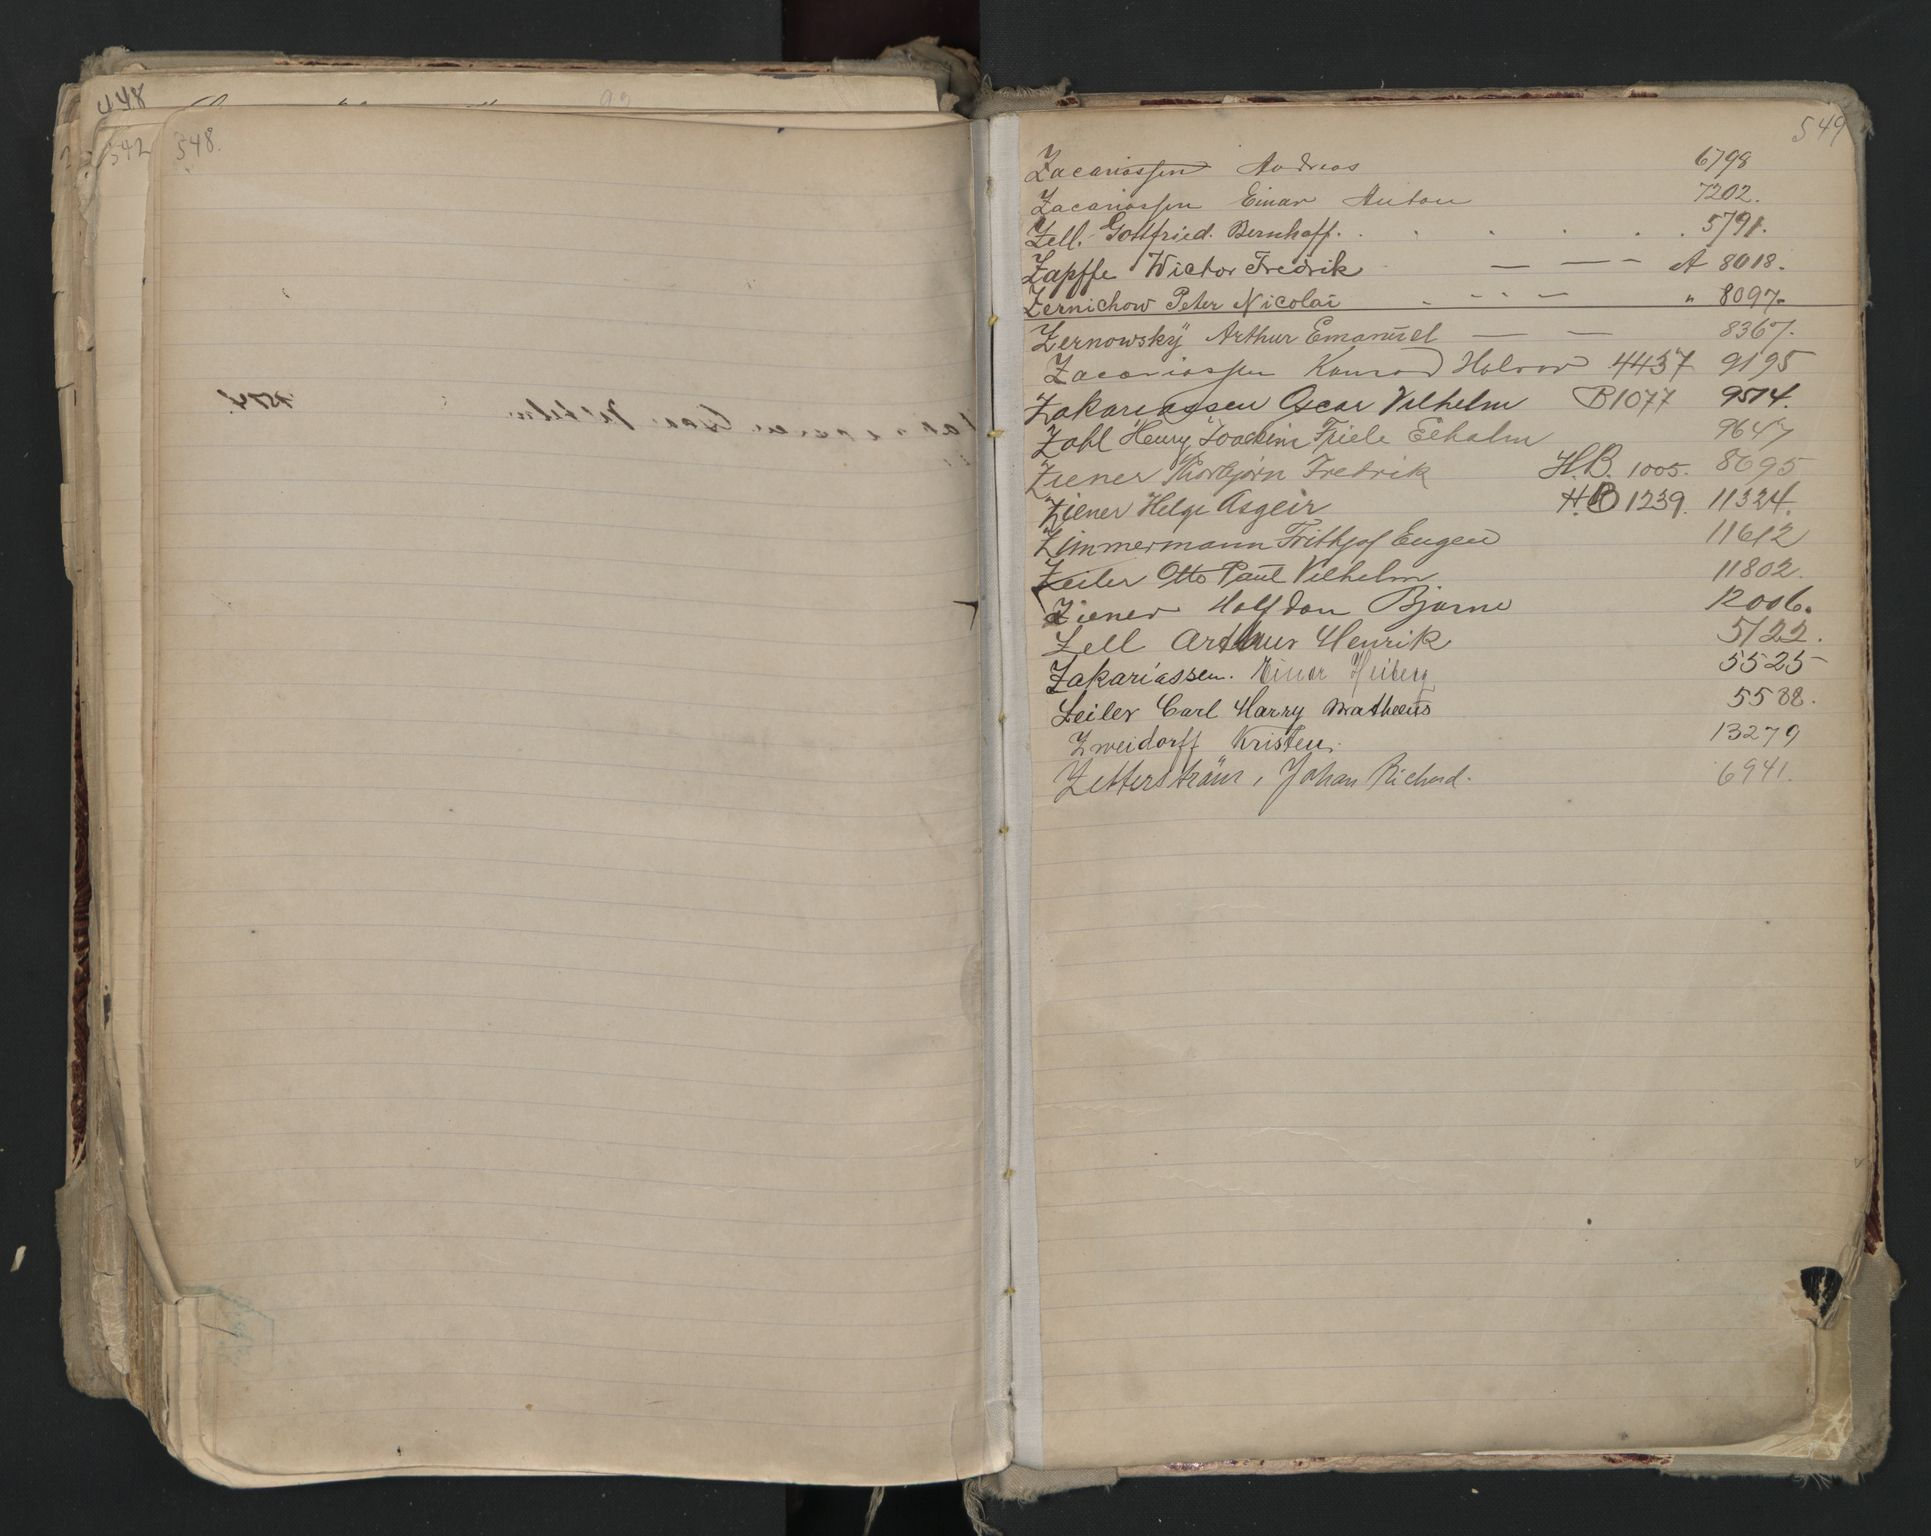 SAO, Oslo sjømannskontor, F/Fa/L0002: Register for Kristiania krets, 1866-1930, s. 548-549